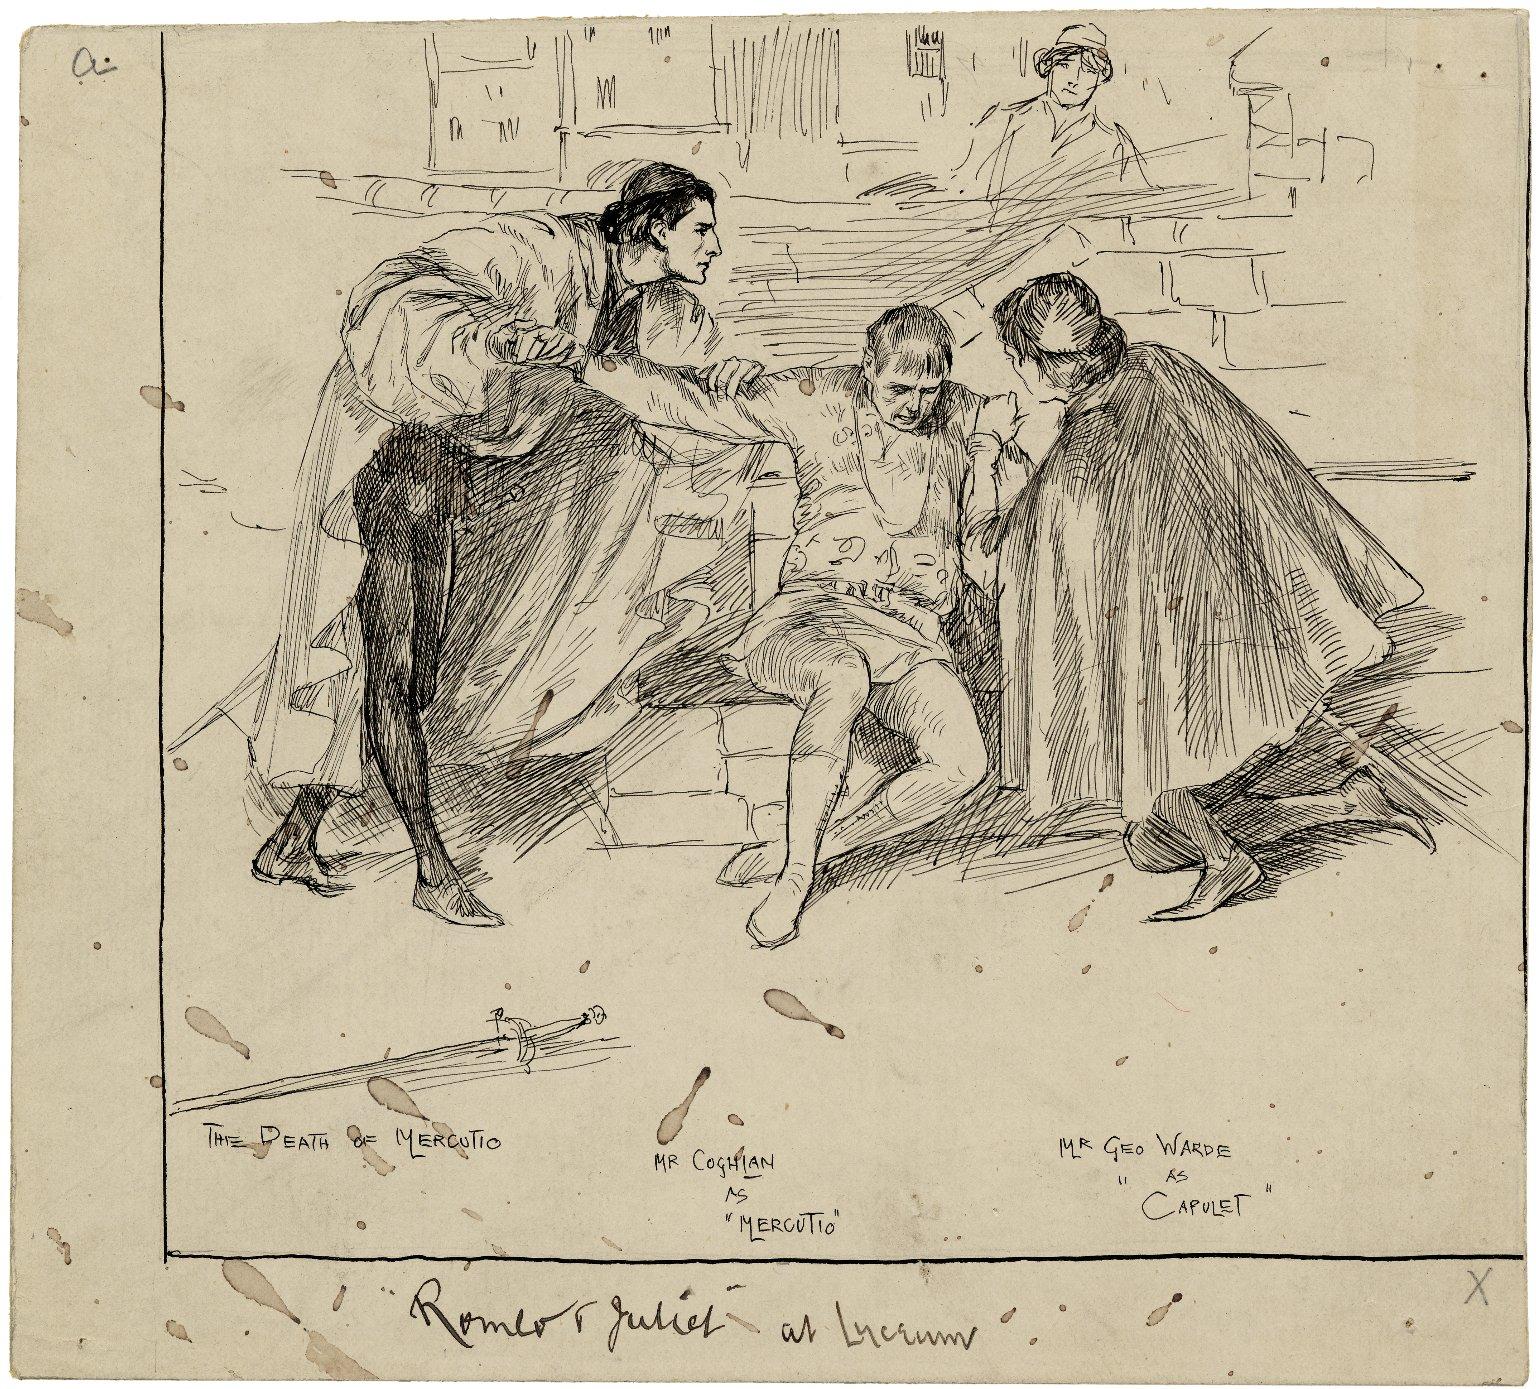 Romeo & Juliet at Lyceum : [graphic] The death of Mercutio, Mr. Coghlan as Mercutio, Mr. Geo. Warde as Capulet / [Frederick Pegram].